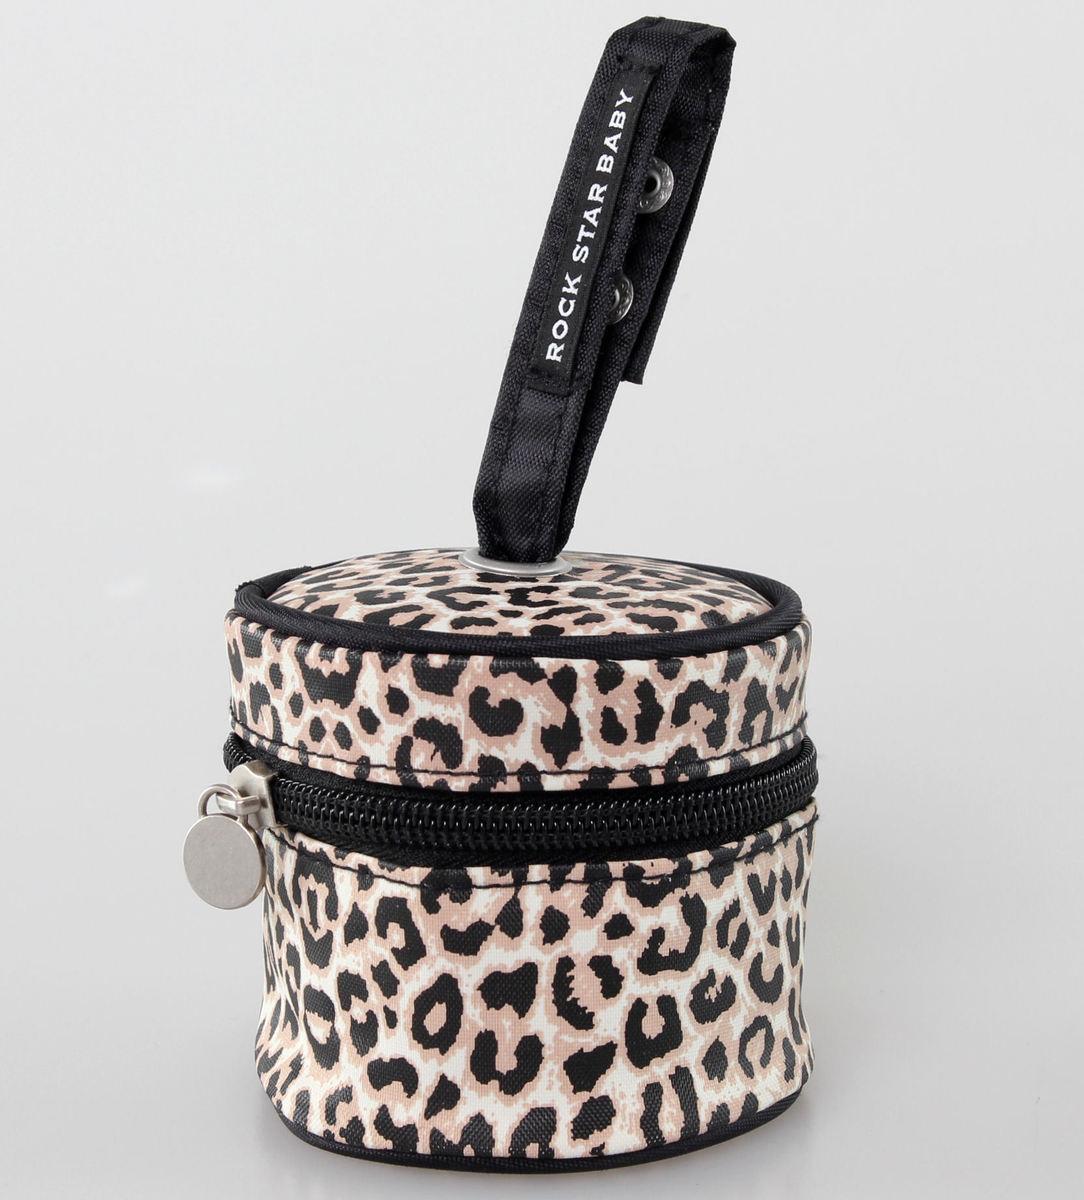 taštička na dudlík ROCK STAR BABY - Leopard - 90099